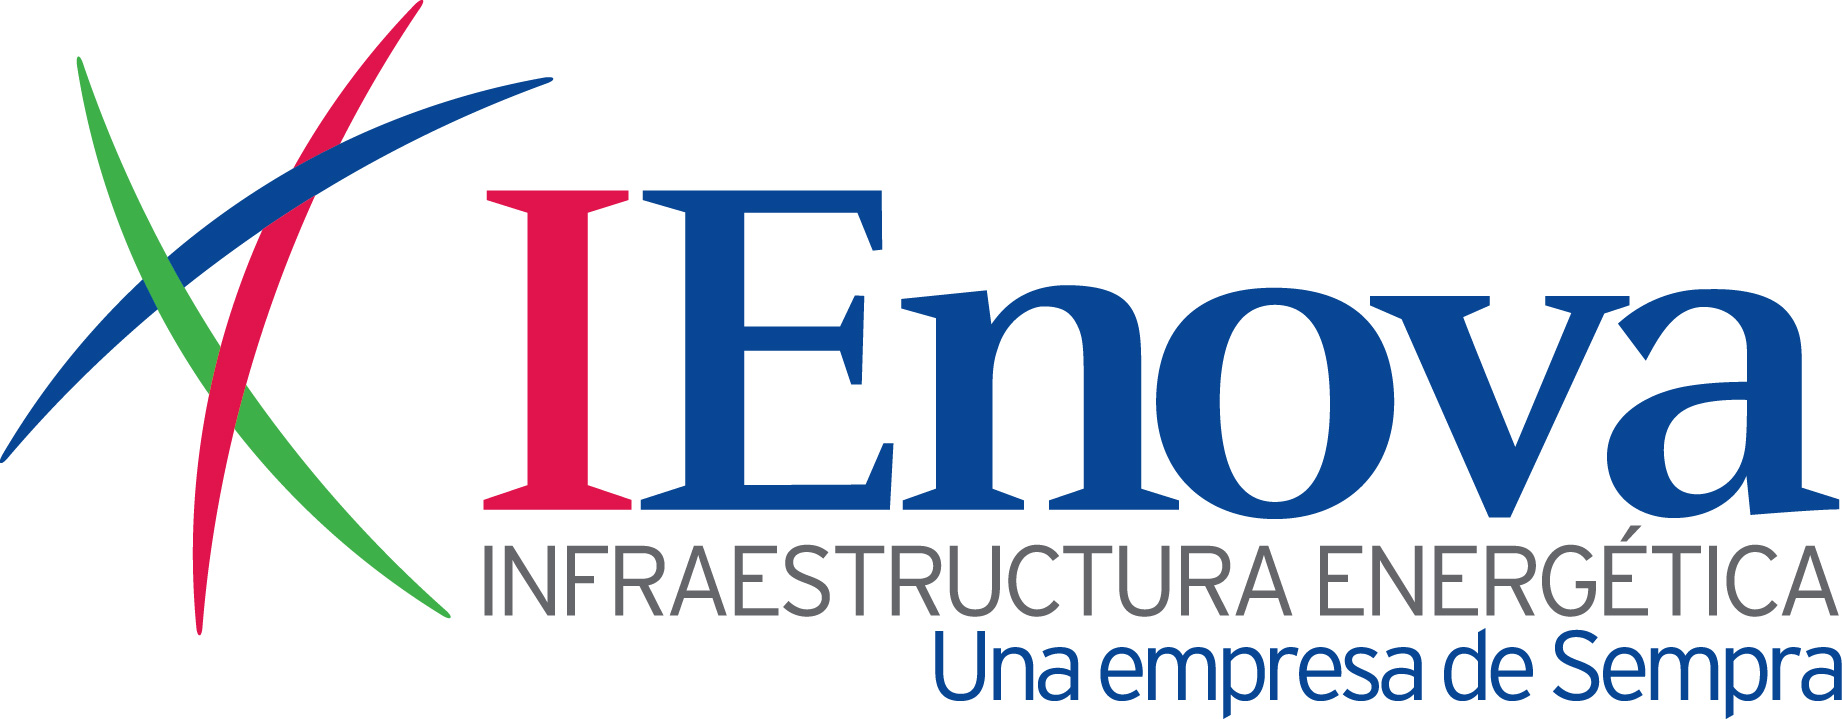 IEnova-LogoRGB.jpg